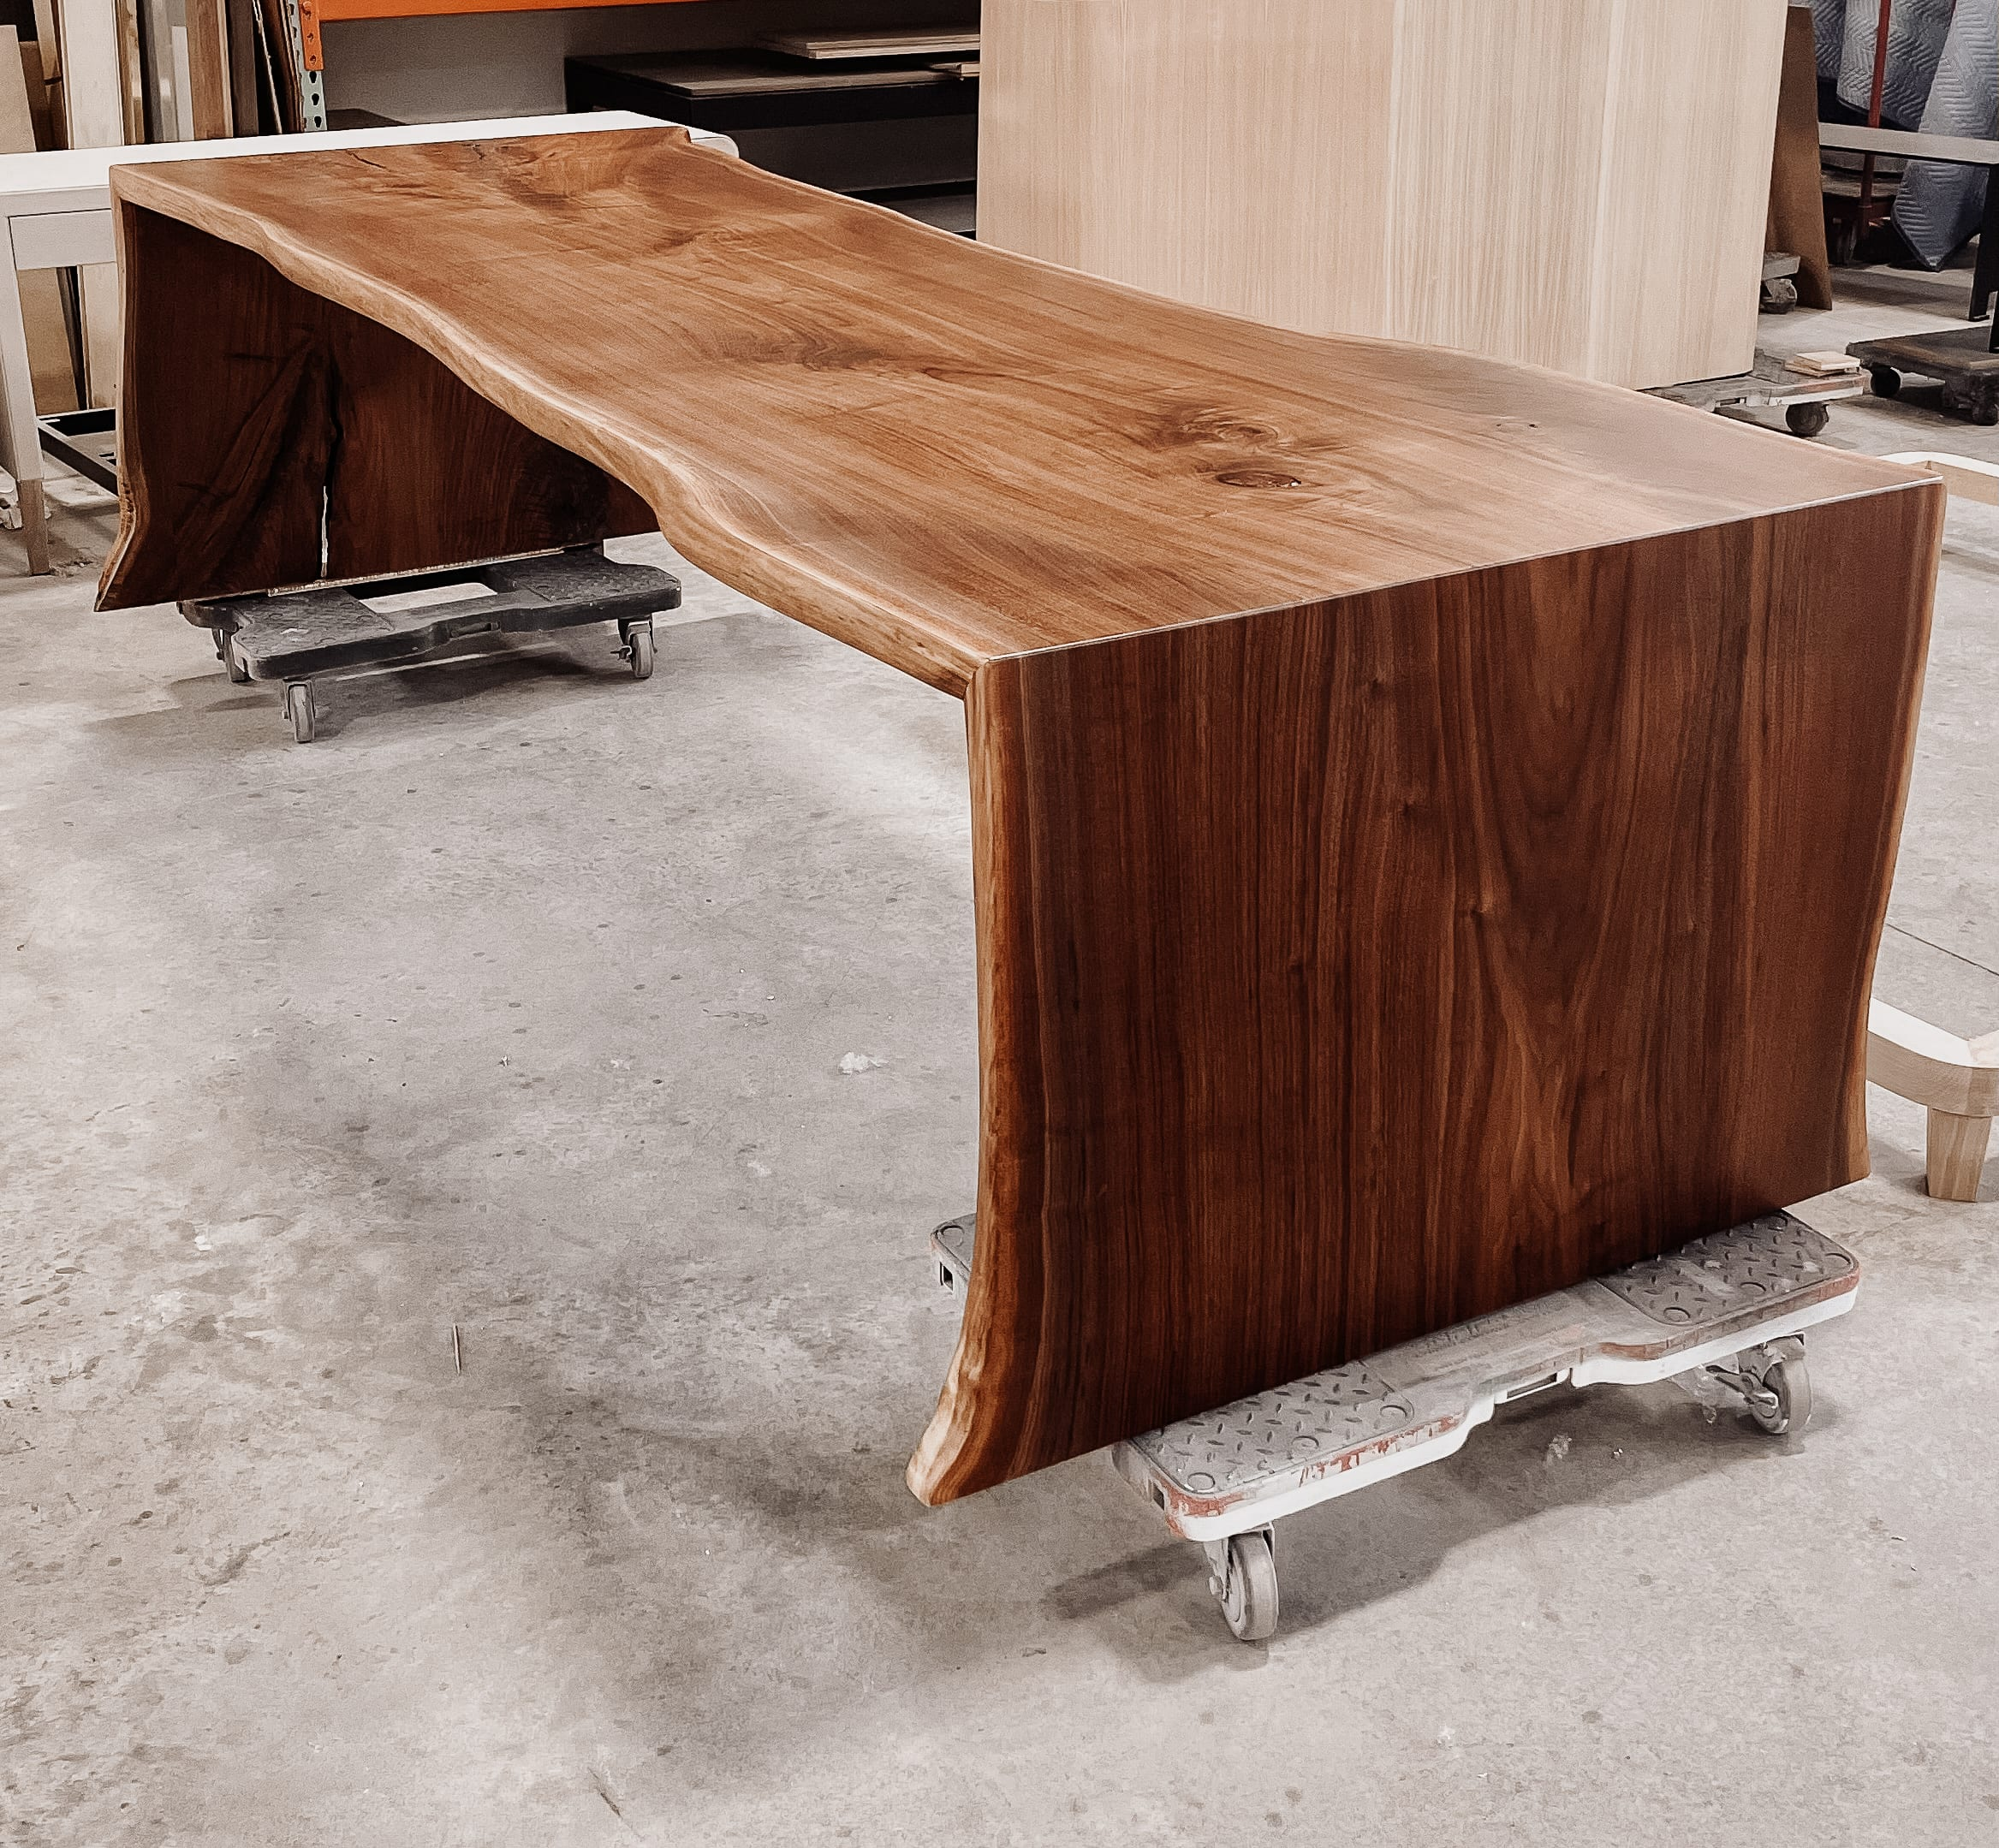 10' x 4' figured walnut dining table